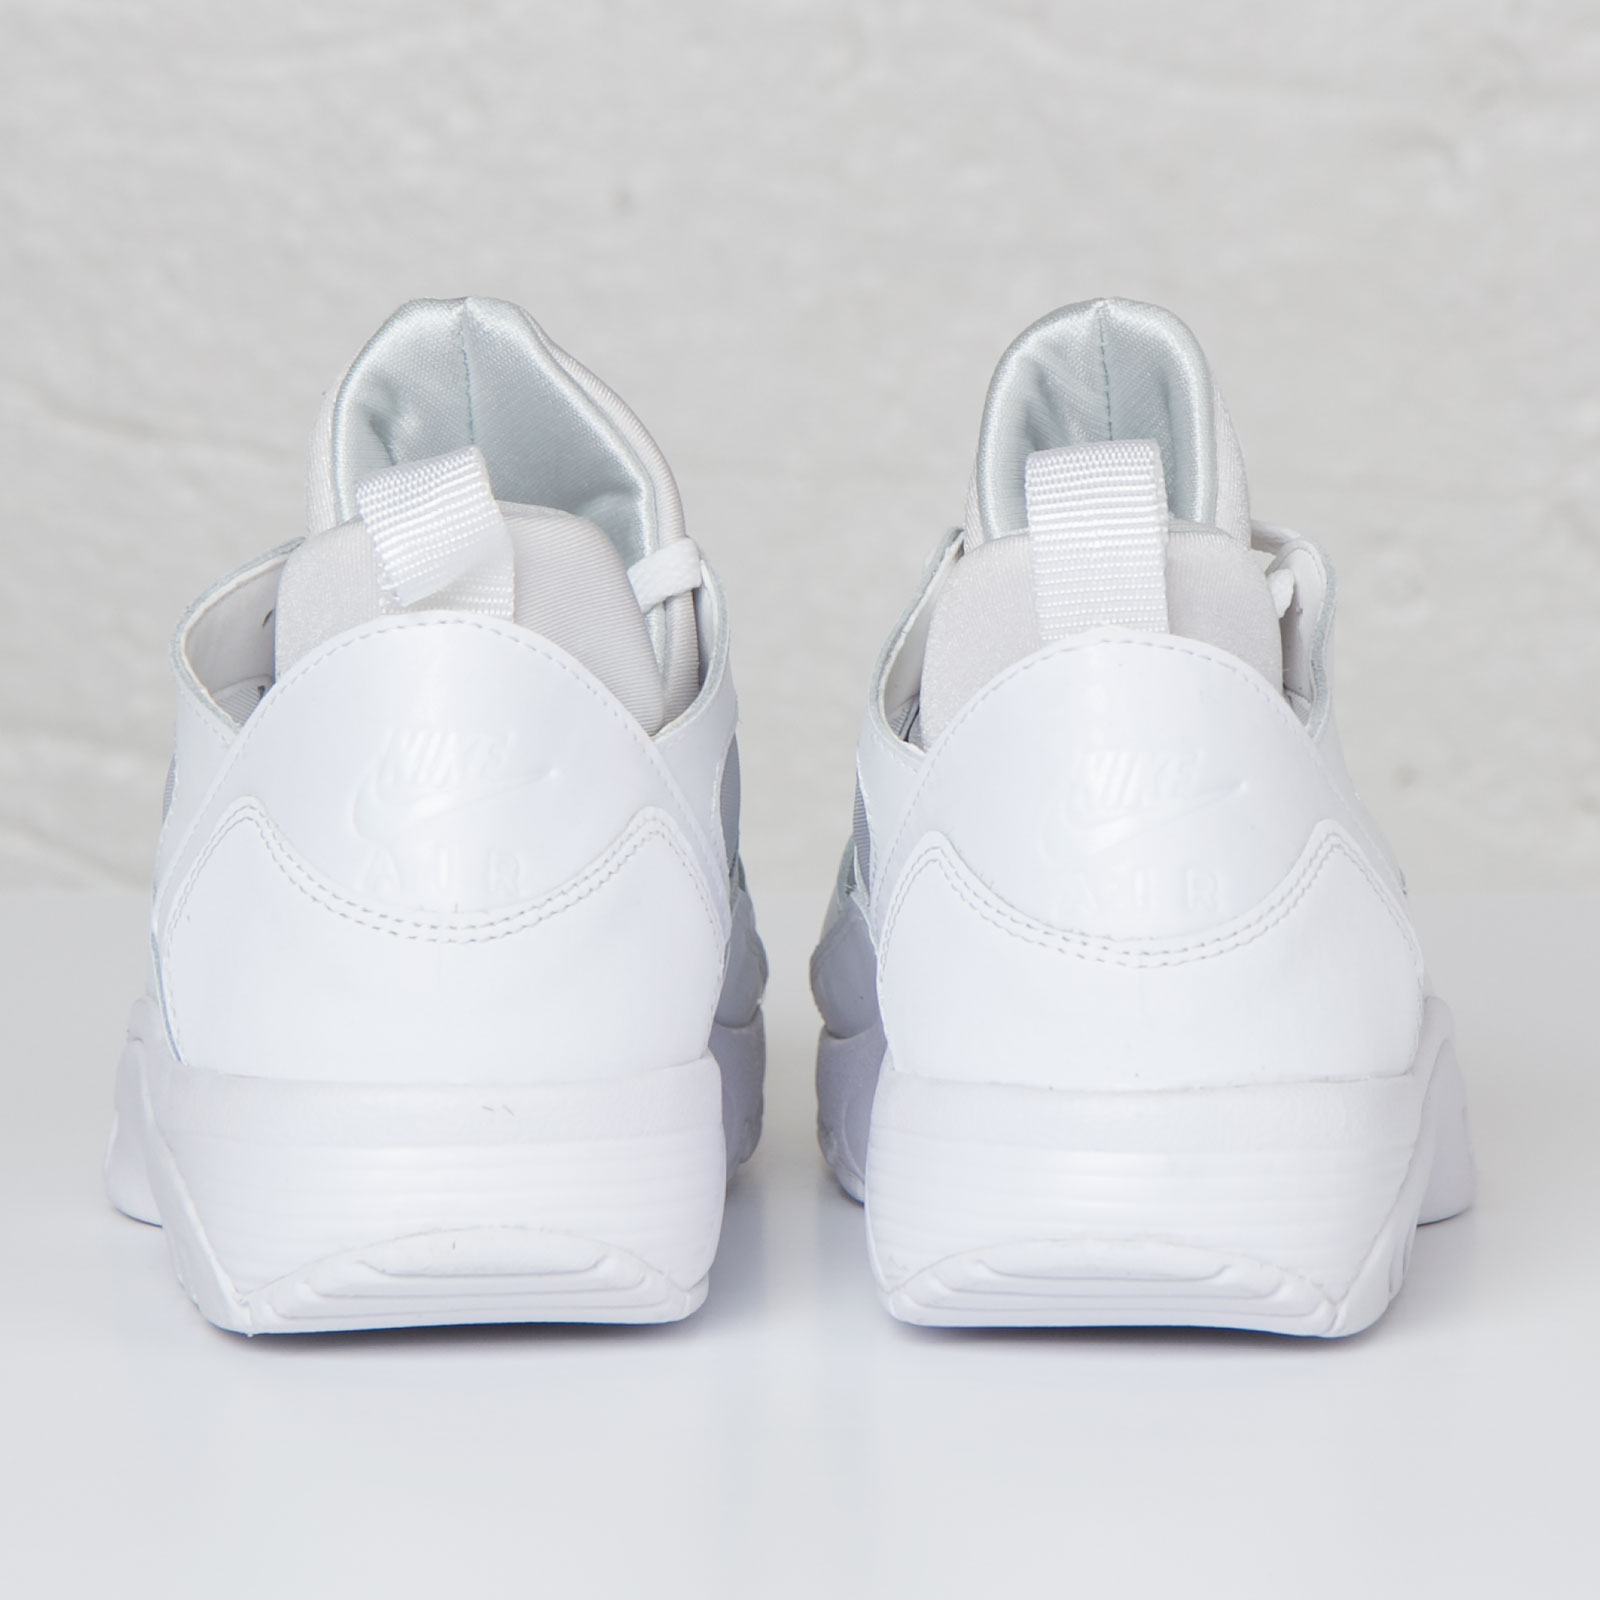 d89dea6e9640 Nike Air Trainer Huarache Low - 749447-100 - Sneakersnstuff ...